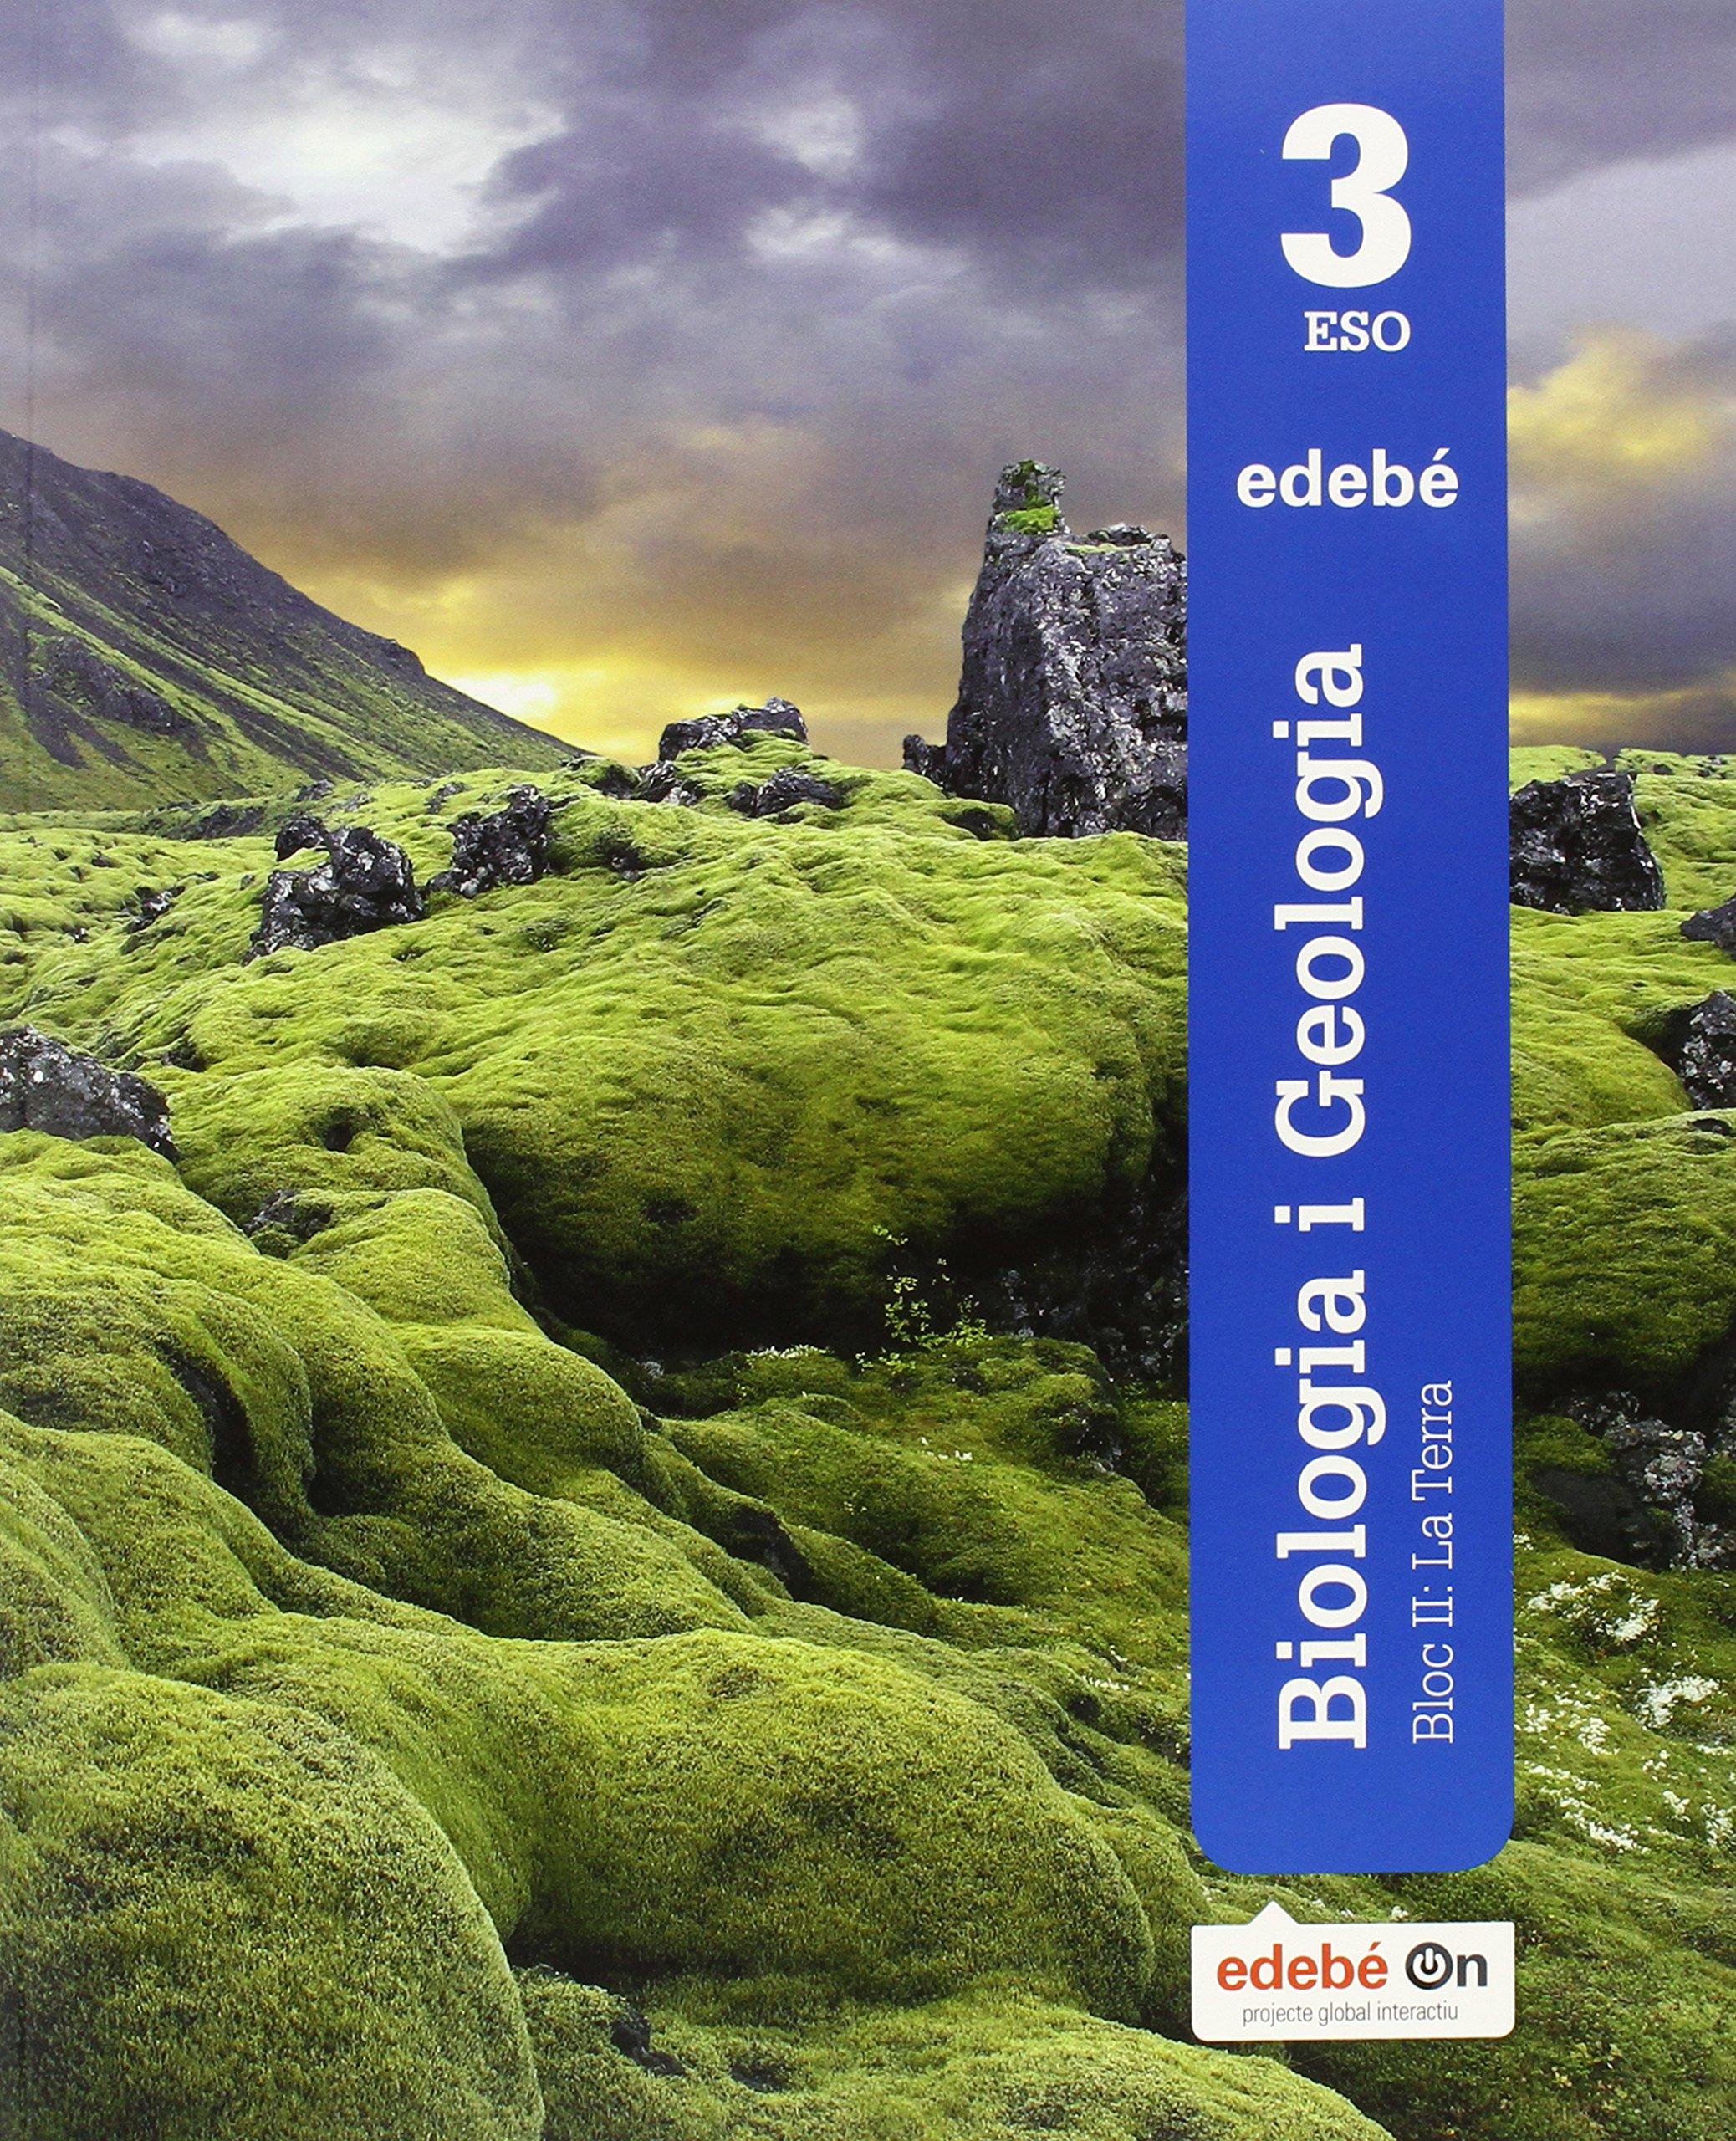 Biologia i Geologia 3 - 9788468320830: Amazon.es: Edebé, Obra ...